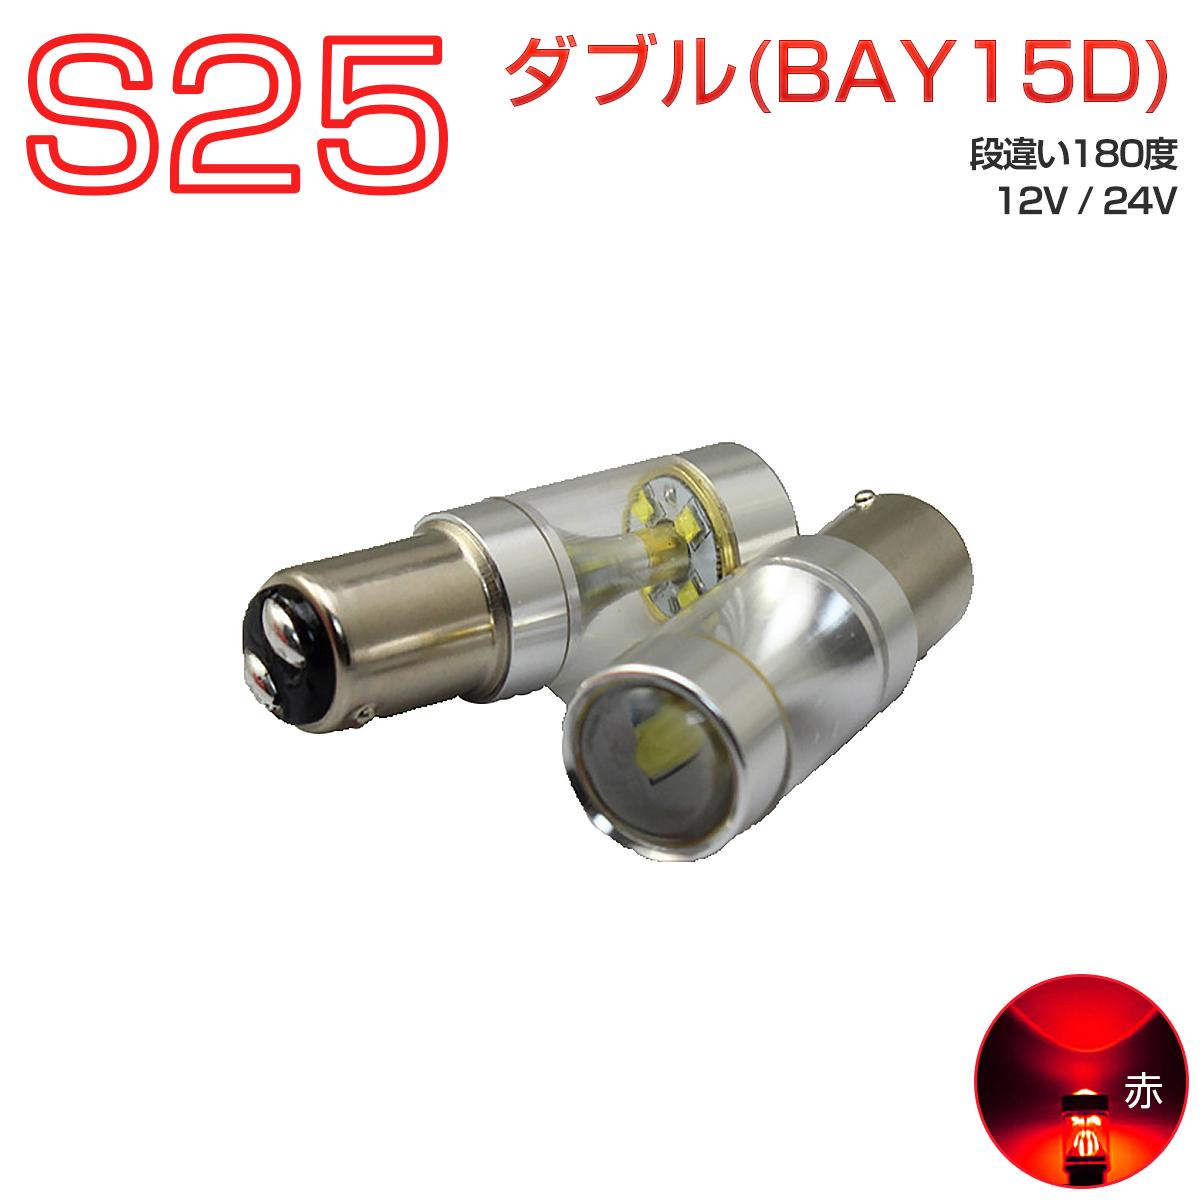 LED S25ダブルBAY15D レッド赤発光 30W CREEチップ フォグランプ ブレーキ ウインカー バックランプ 2個入り 12V 24V SDM便送料無料 1年保証